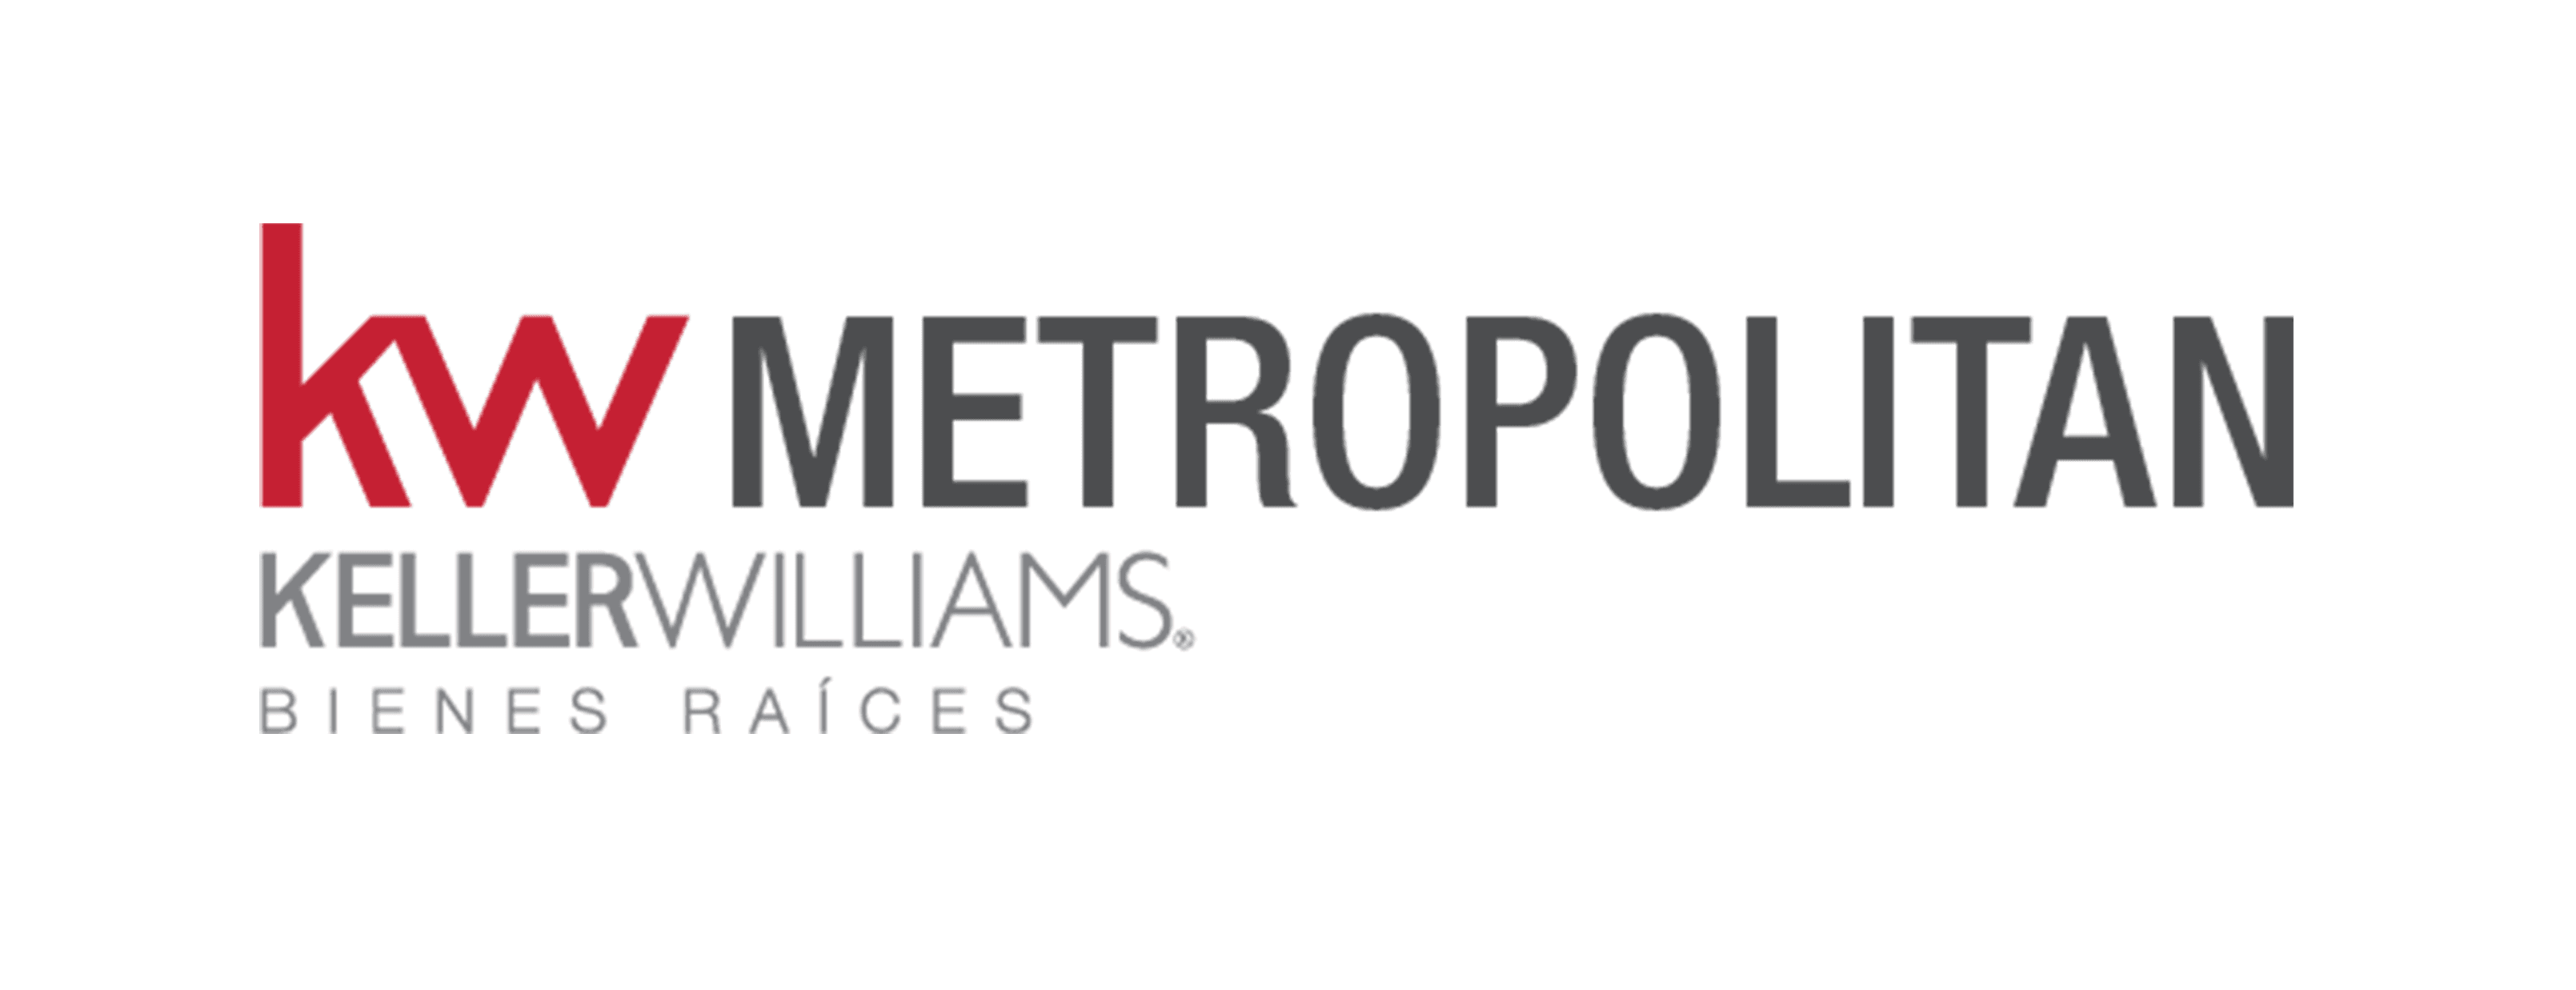 Logo de  Kw Metropolitan